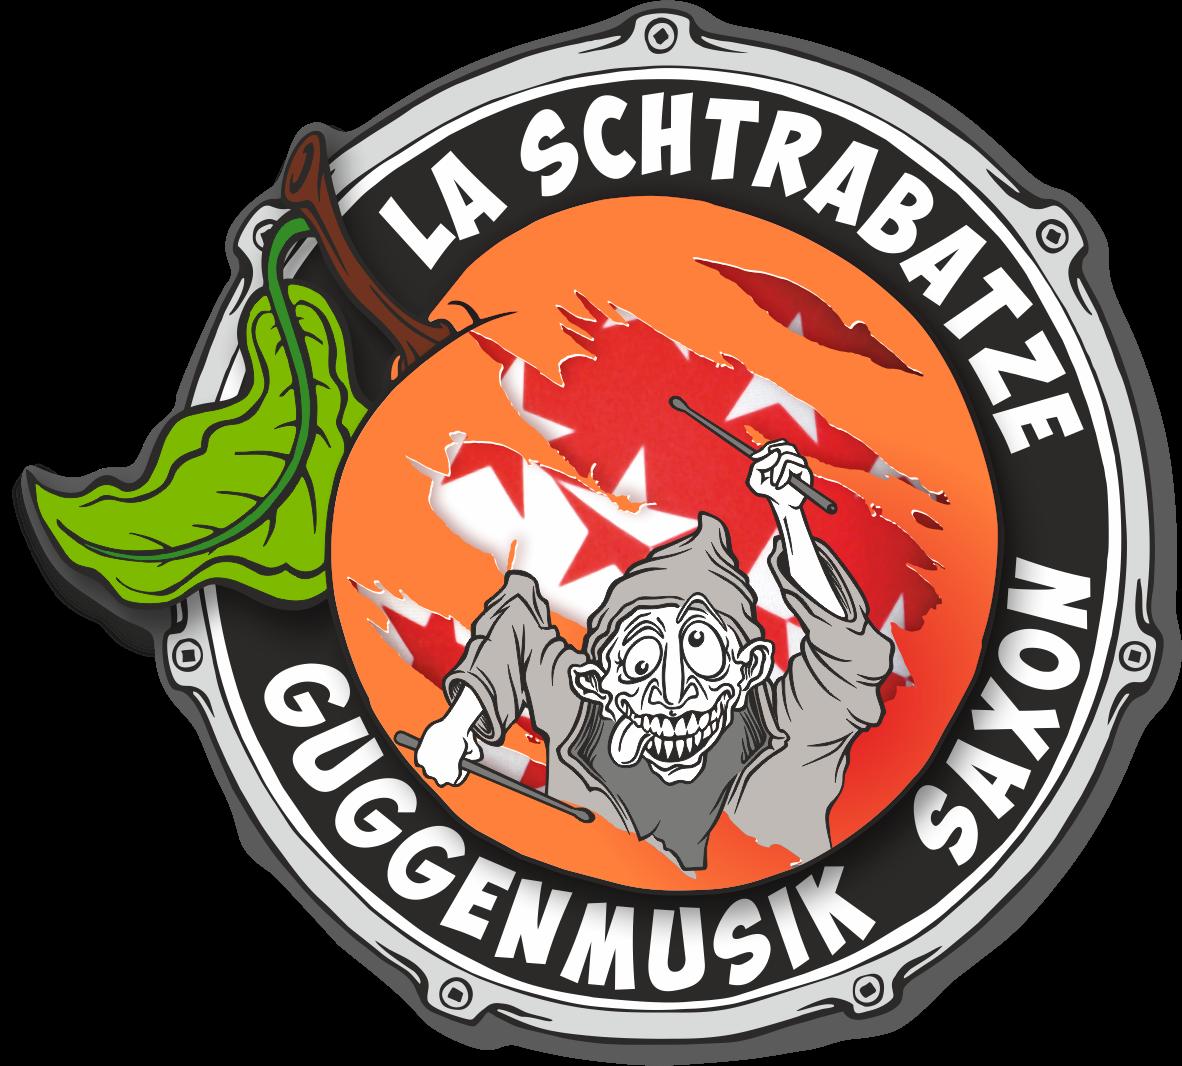 GuggenMusik – La Schtrabatze Saxon